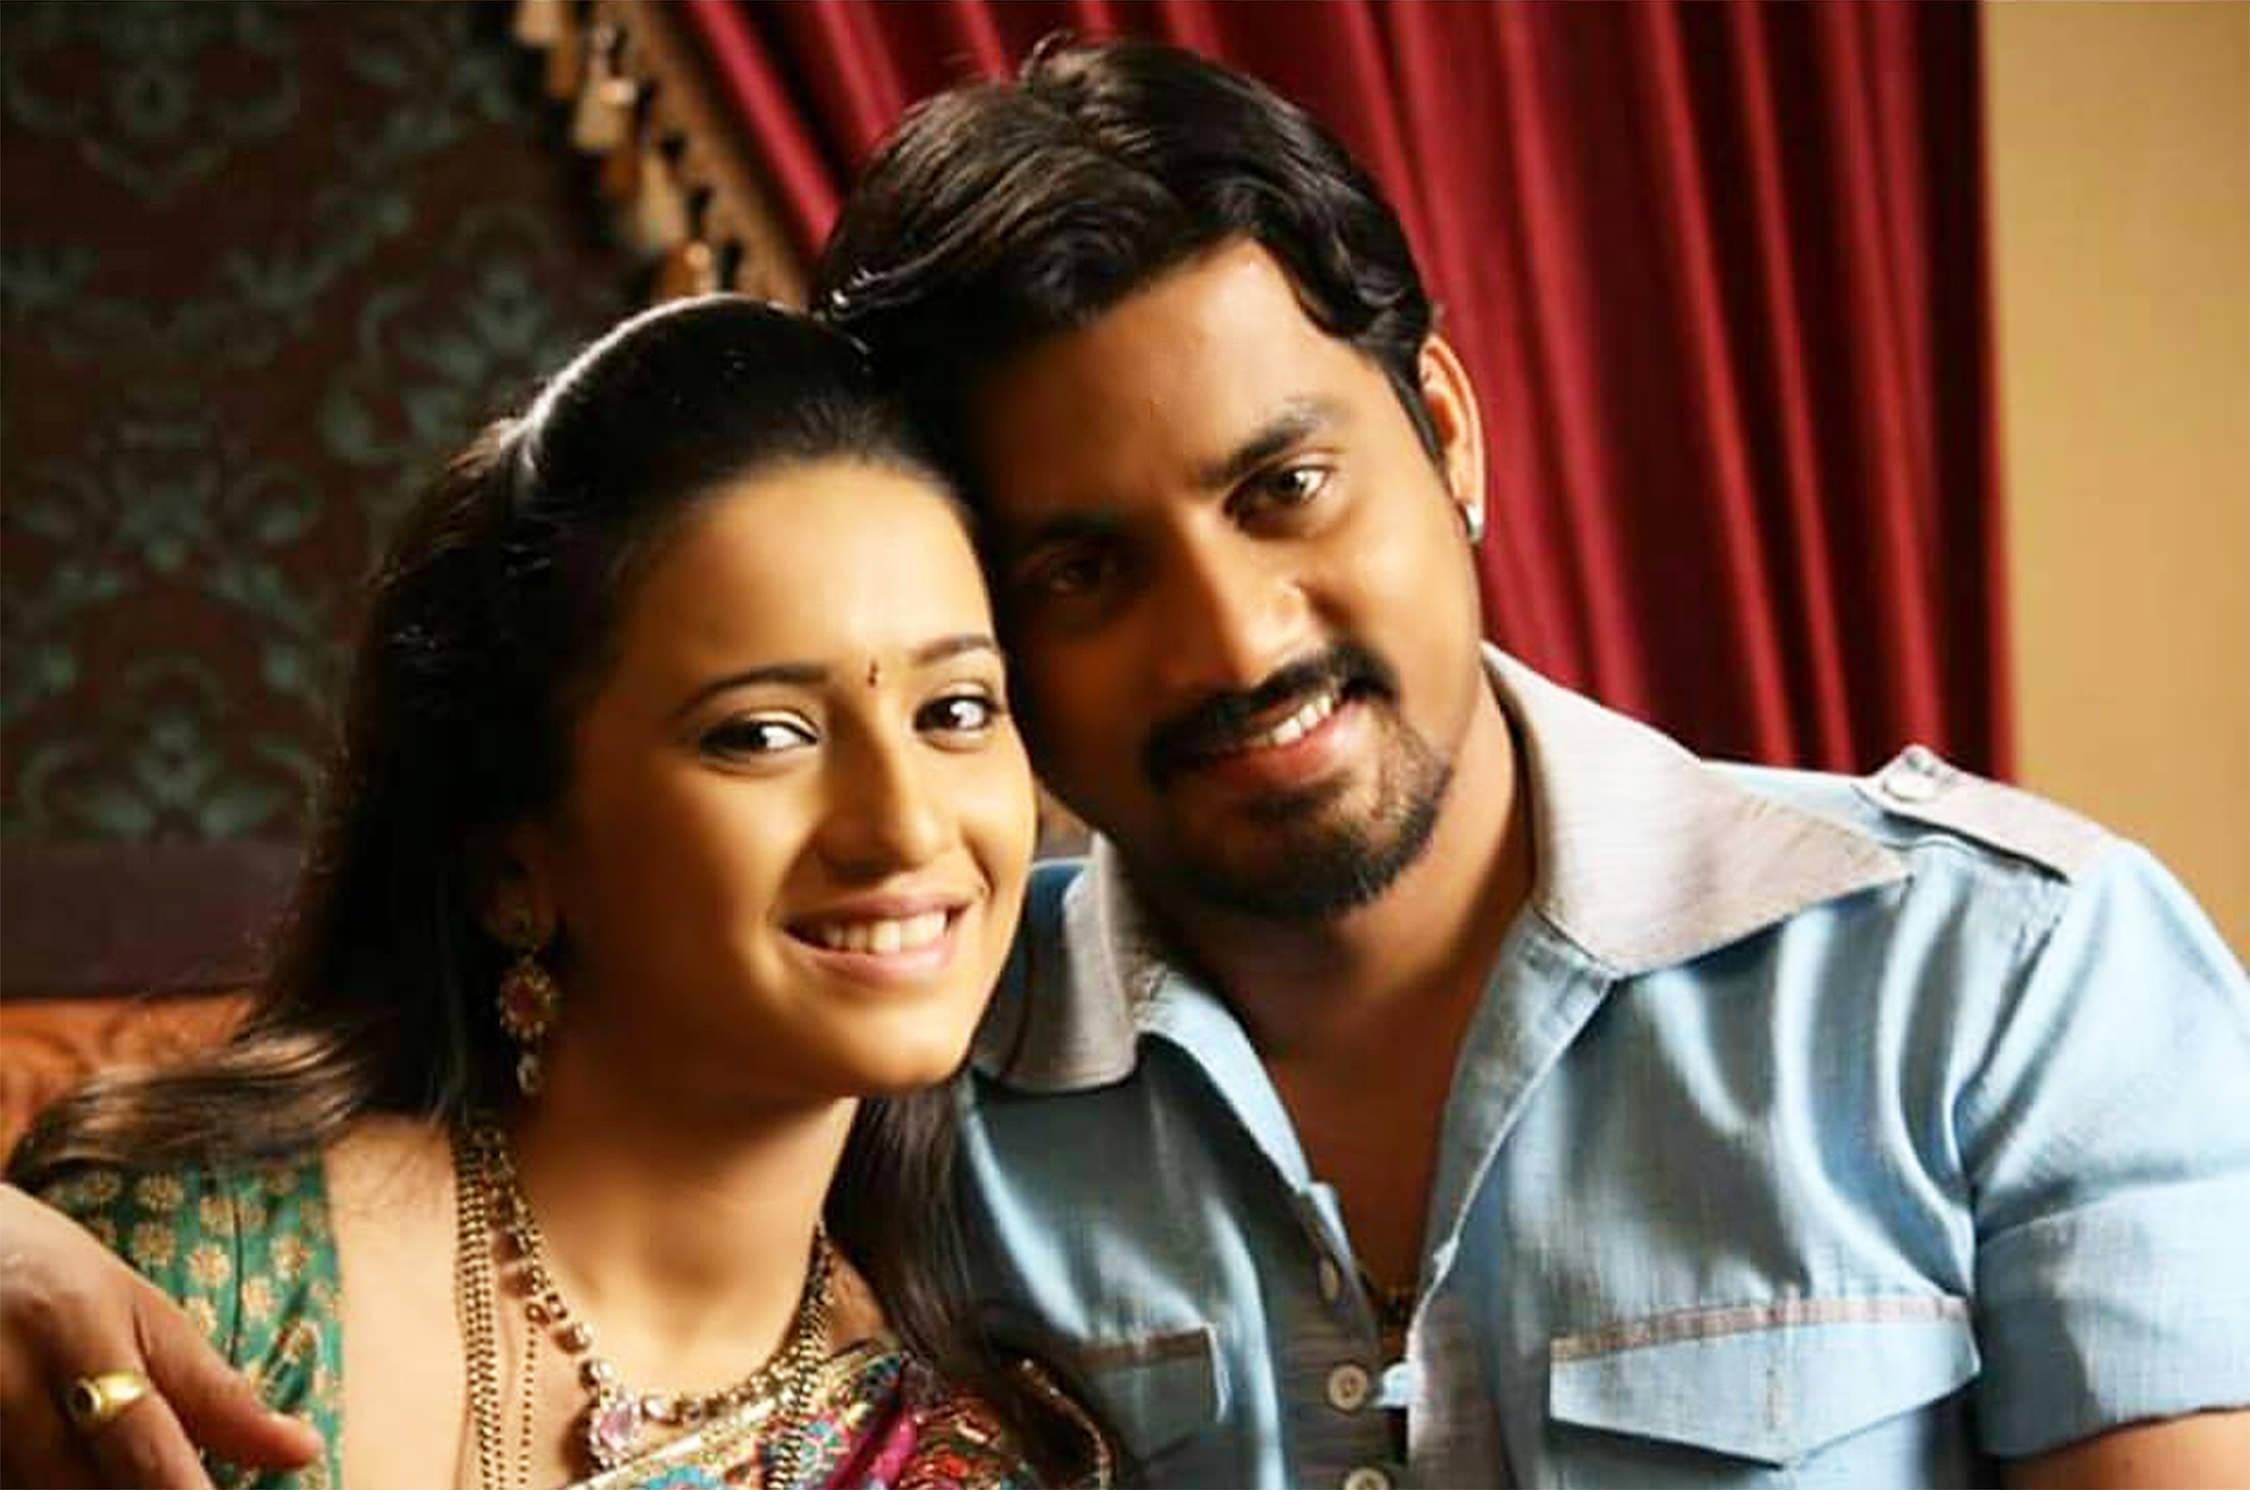 Shivani Surve Deserves to Win Bigg Boss say Shivani's Co-Stars!